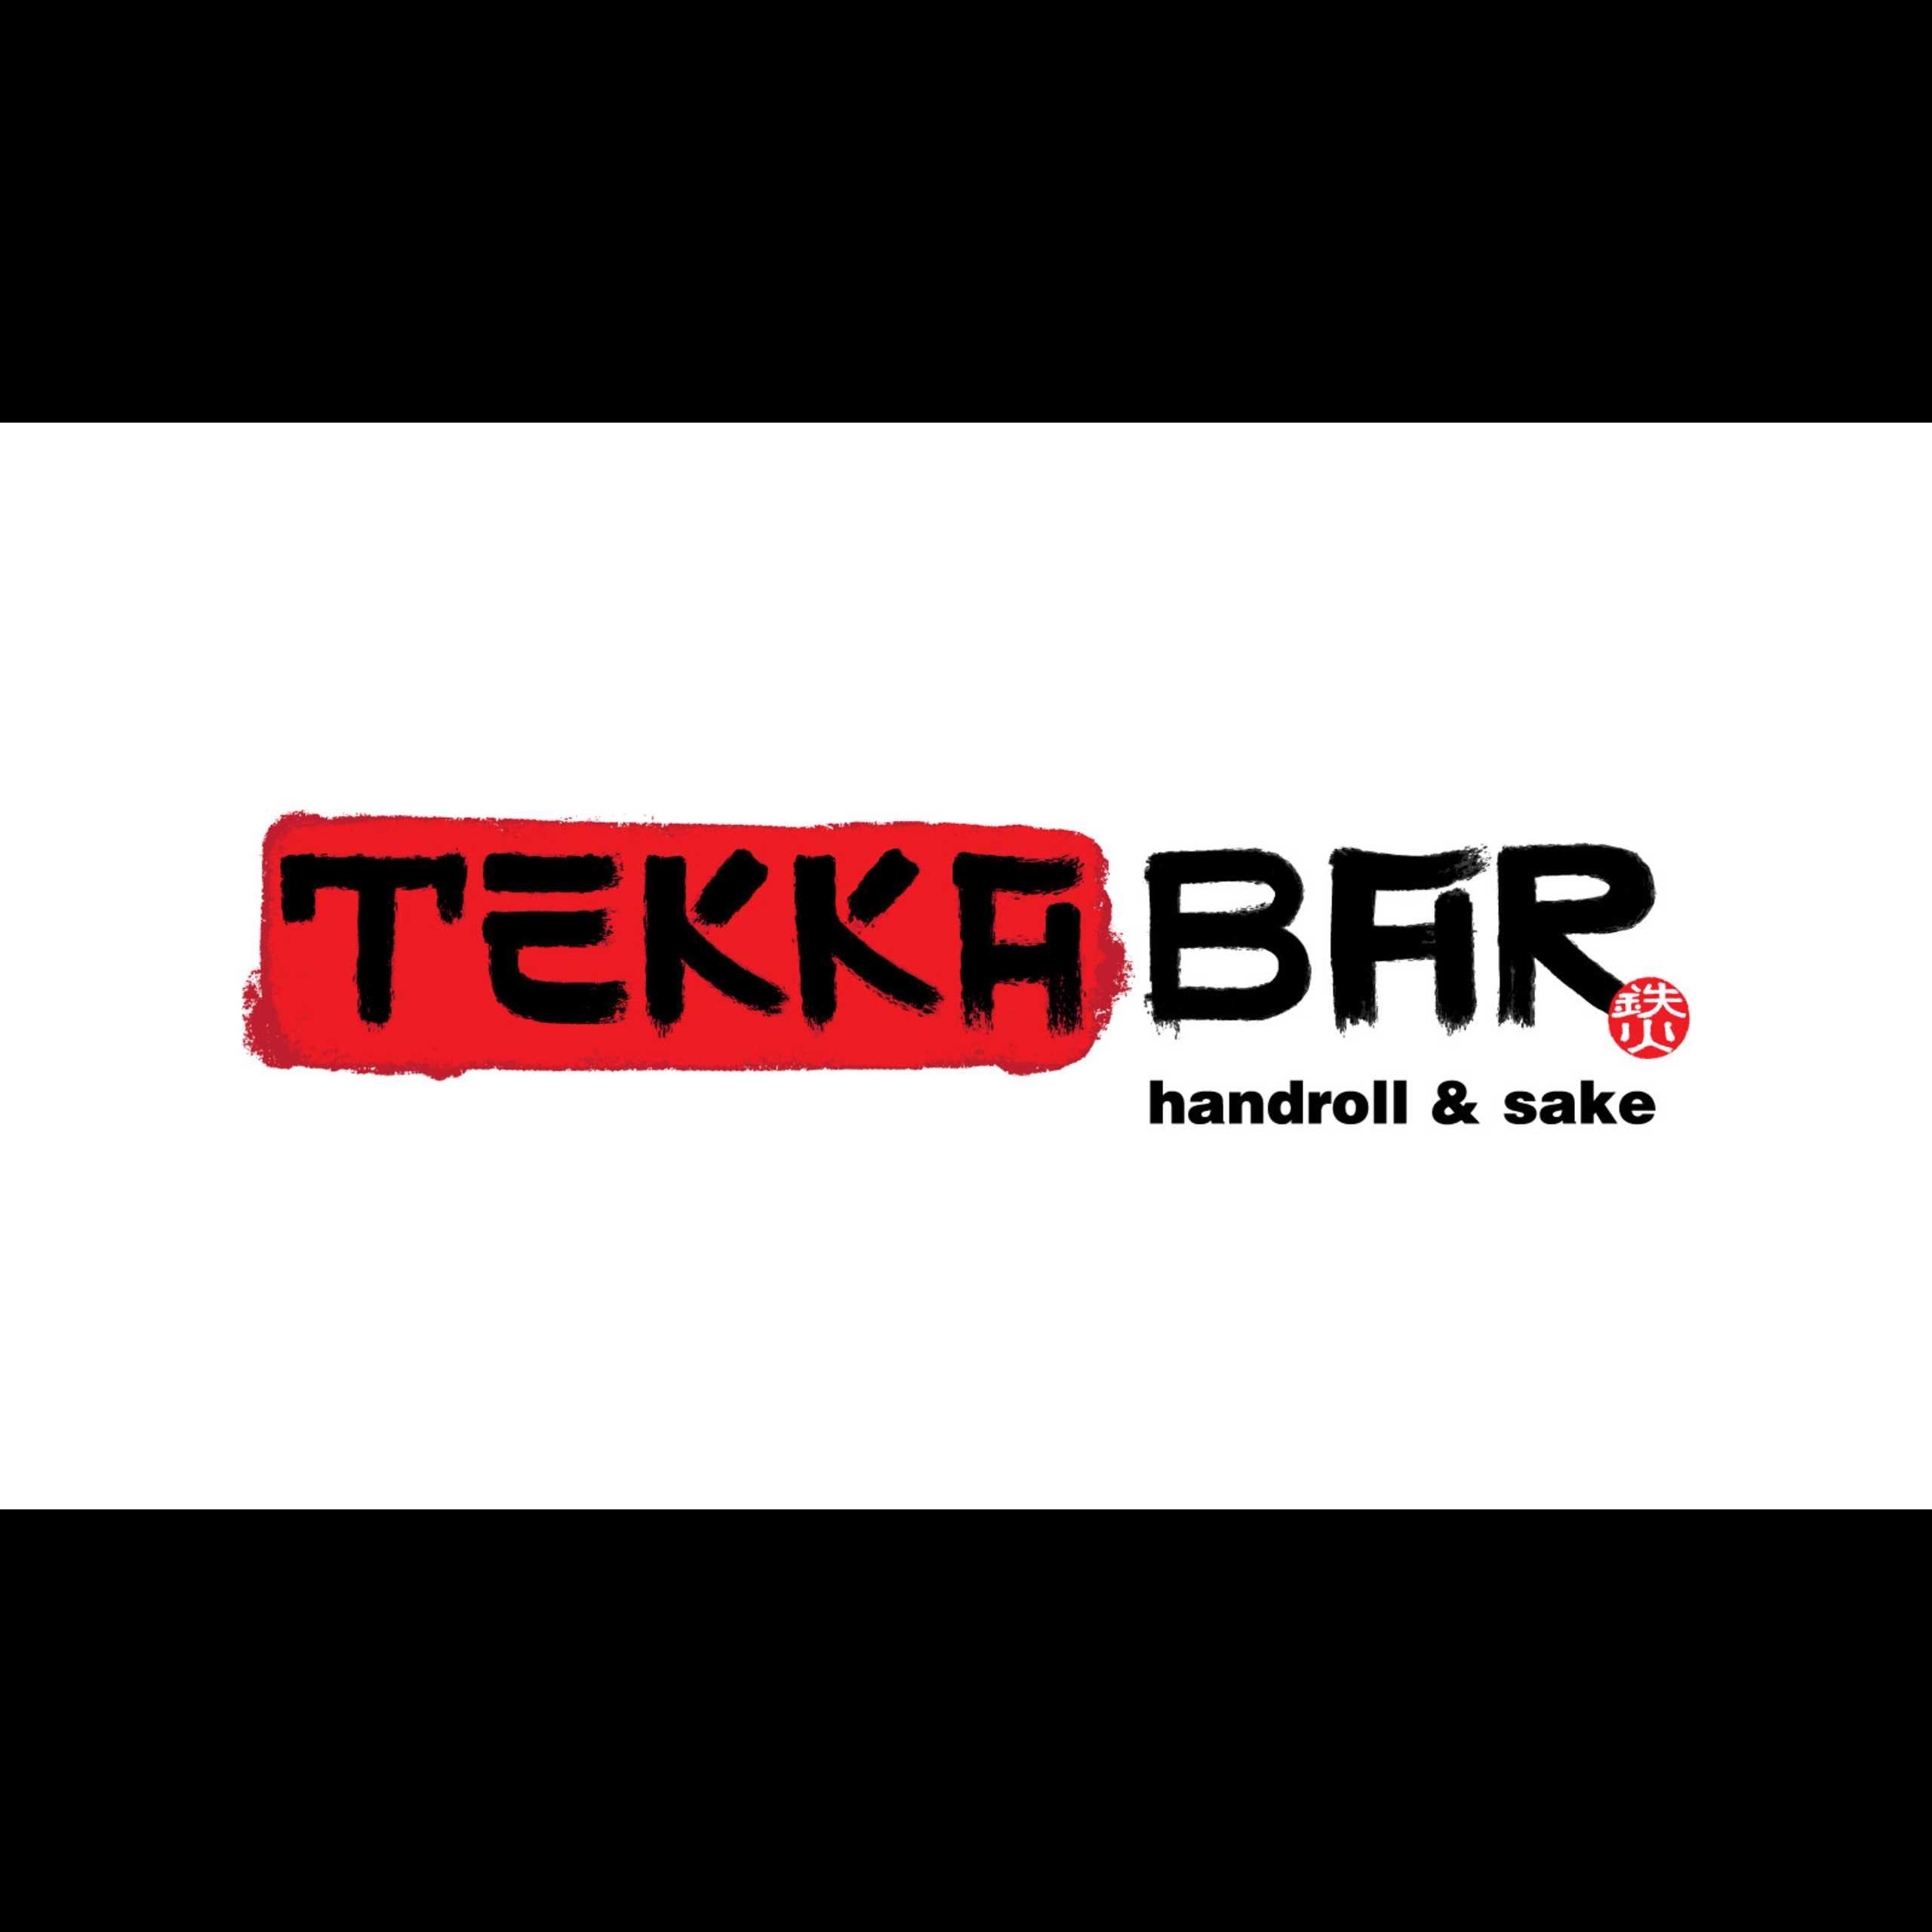 Tekka Bar: Handroll & Sake image 0